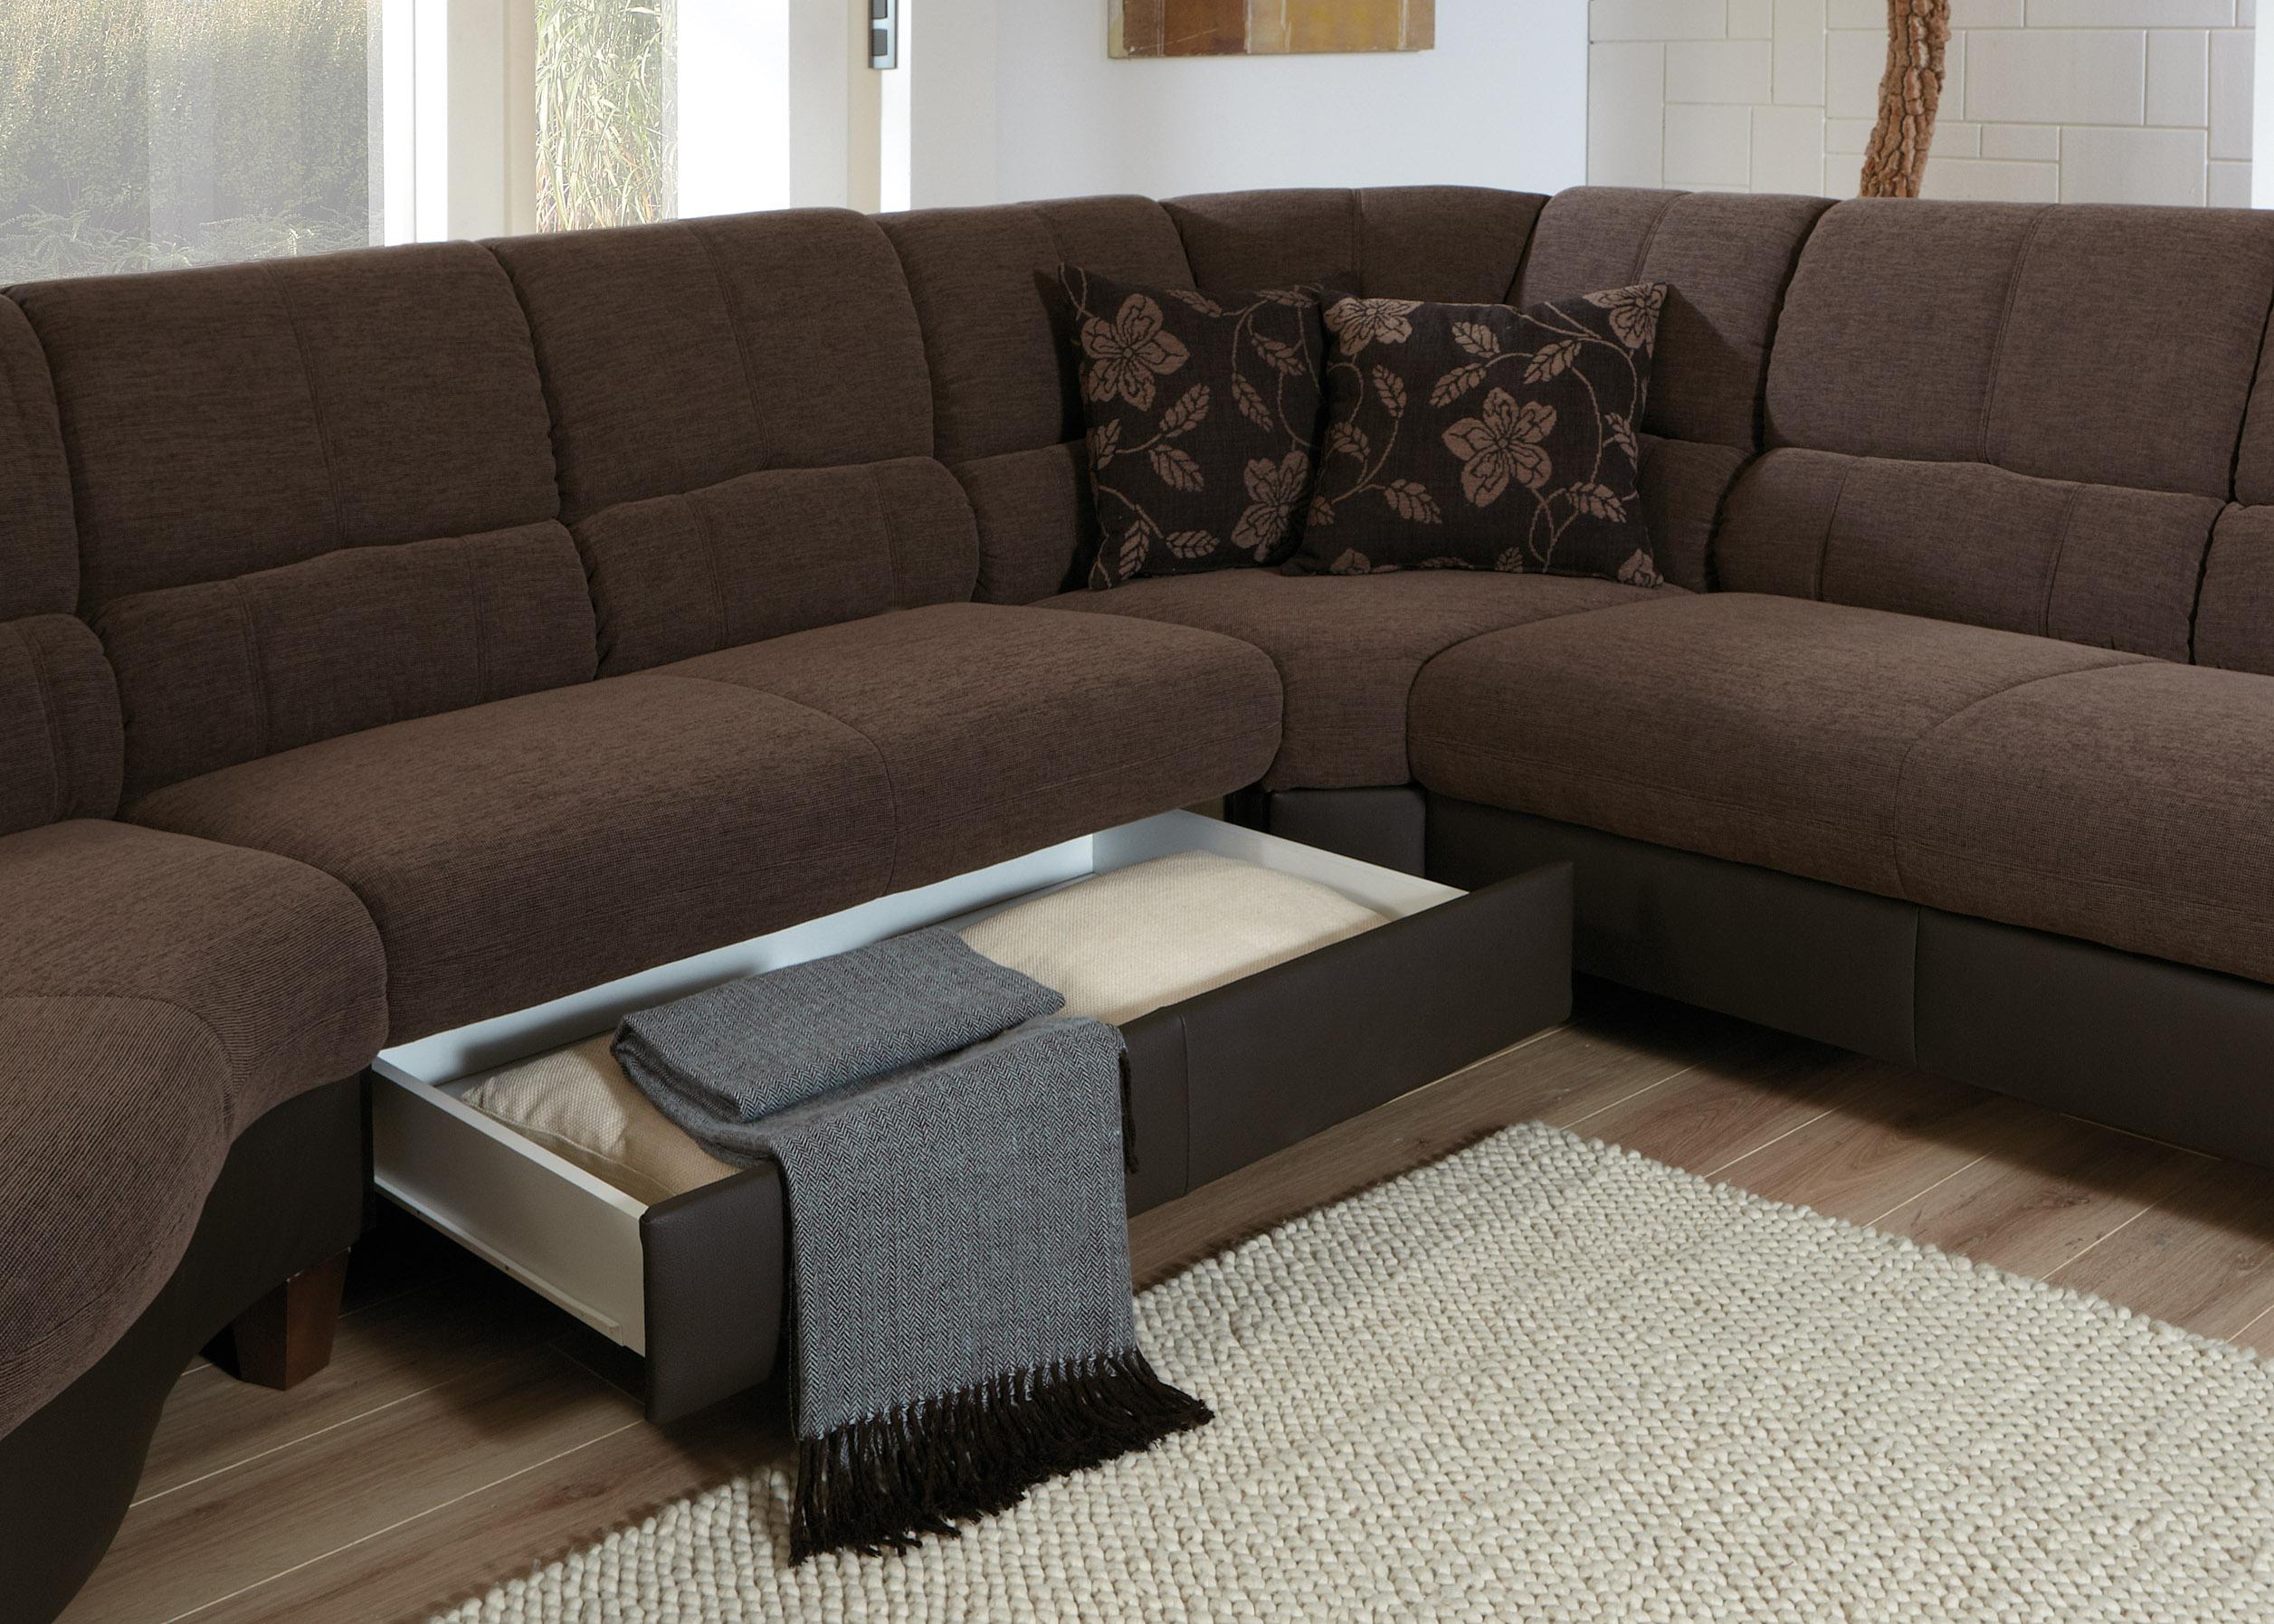 zehdenick farini s wohnlandschaft in braun m bel letz. Black Bedroom Furniture Sets. Home Design Ideas